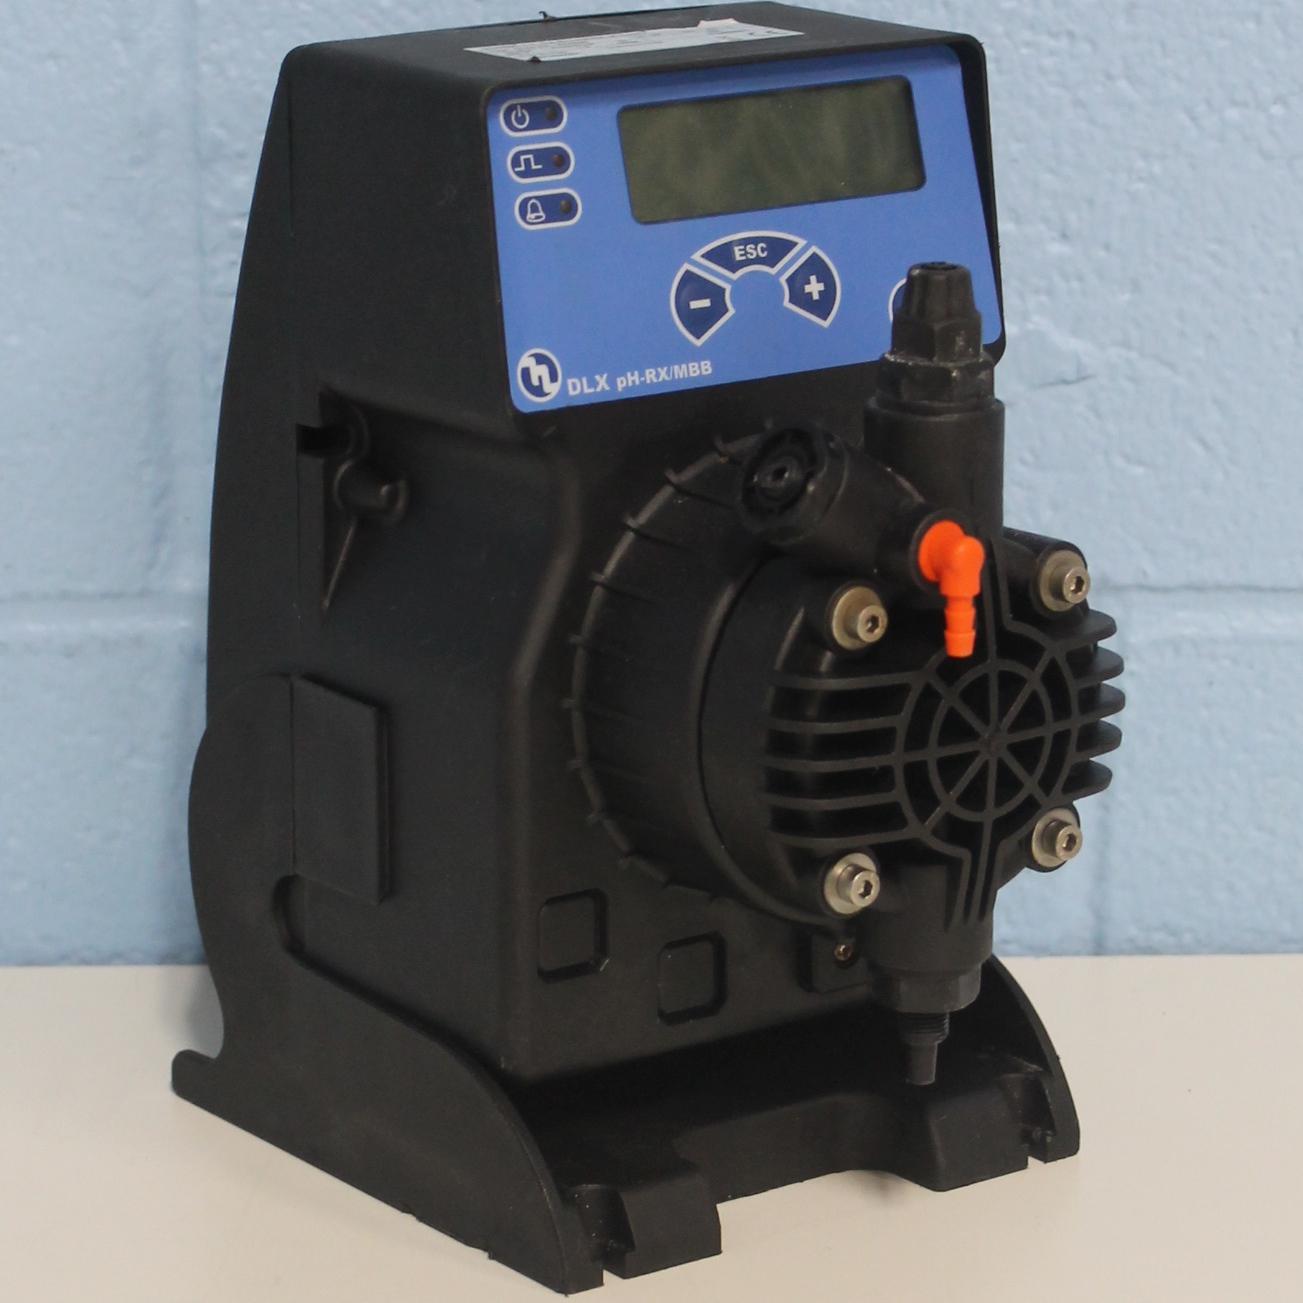 Etatron DLX pH-RX/MBB Electromagnetic Dosing Pump  Image